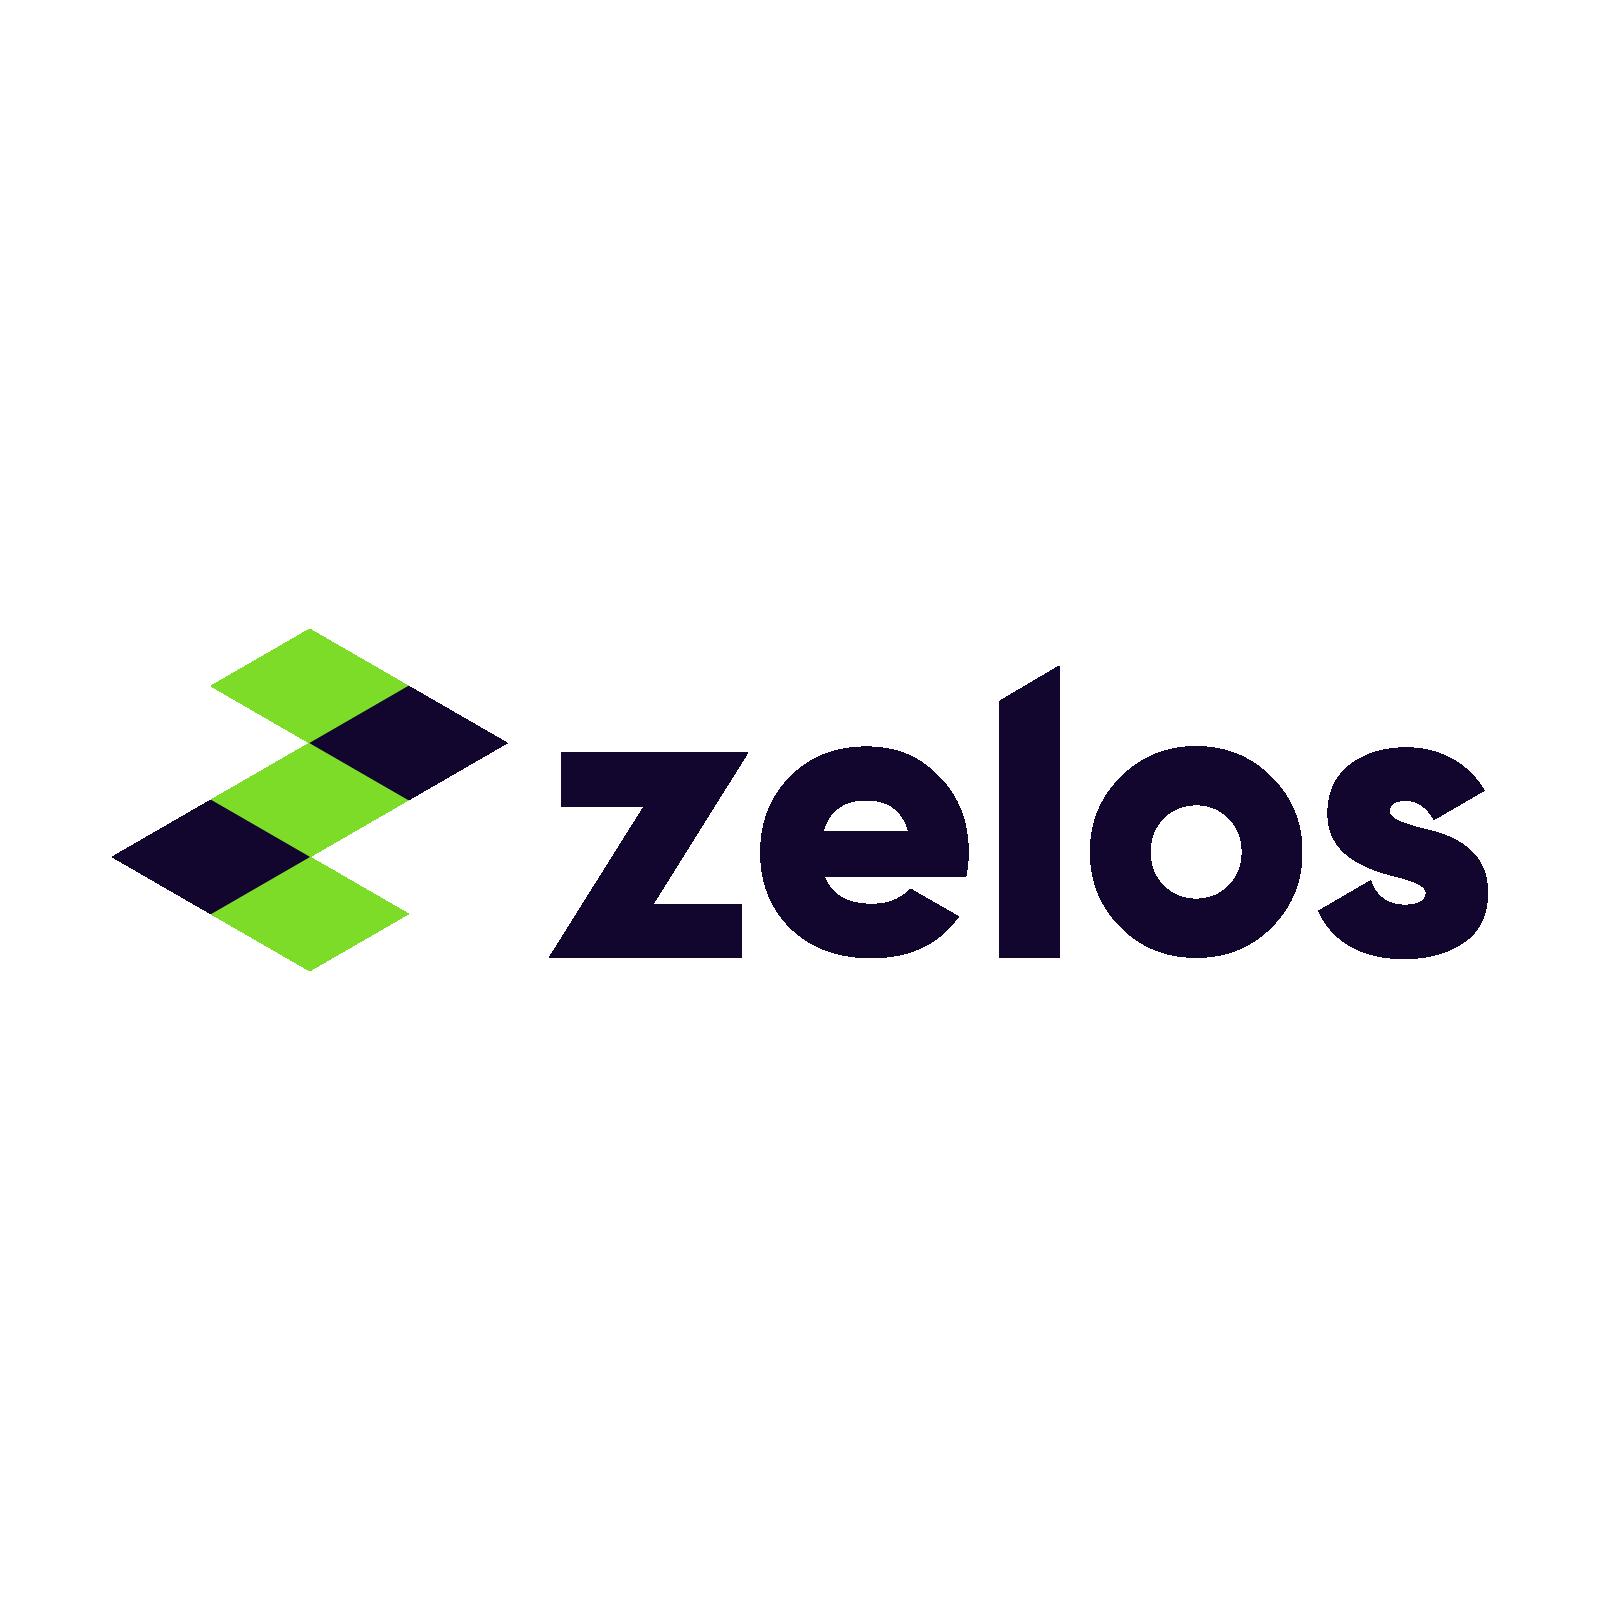 Zelos logo square 800x800